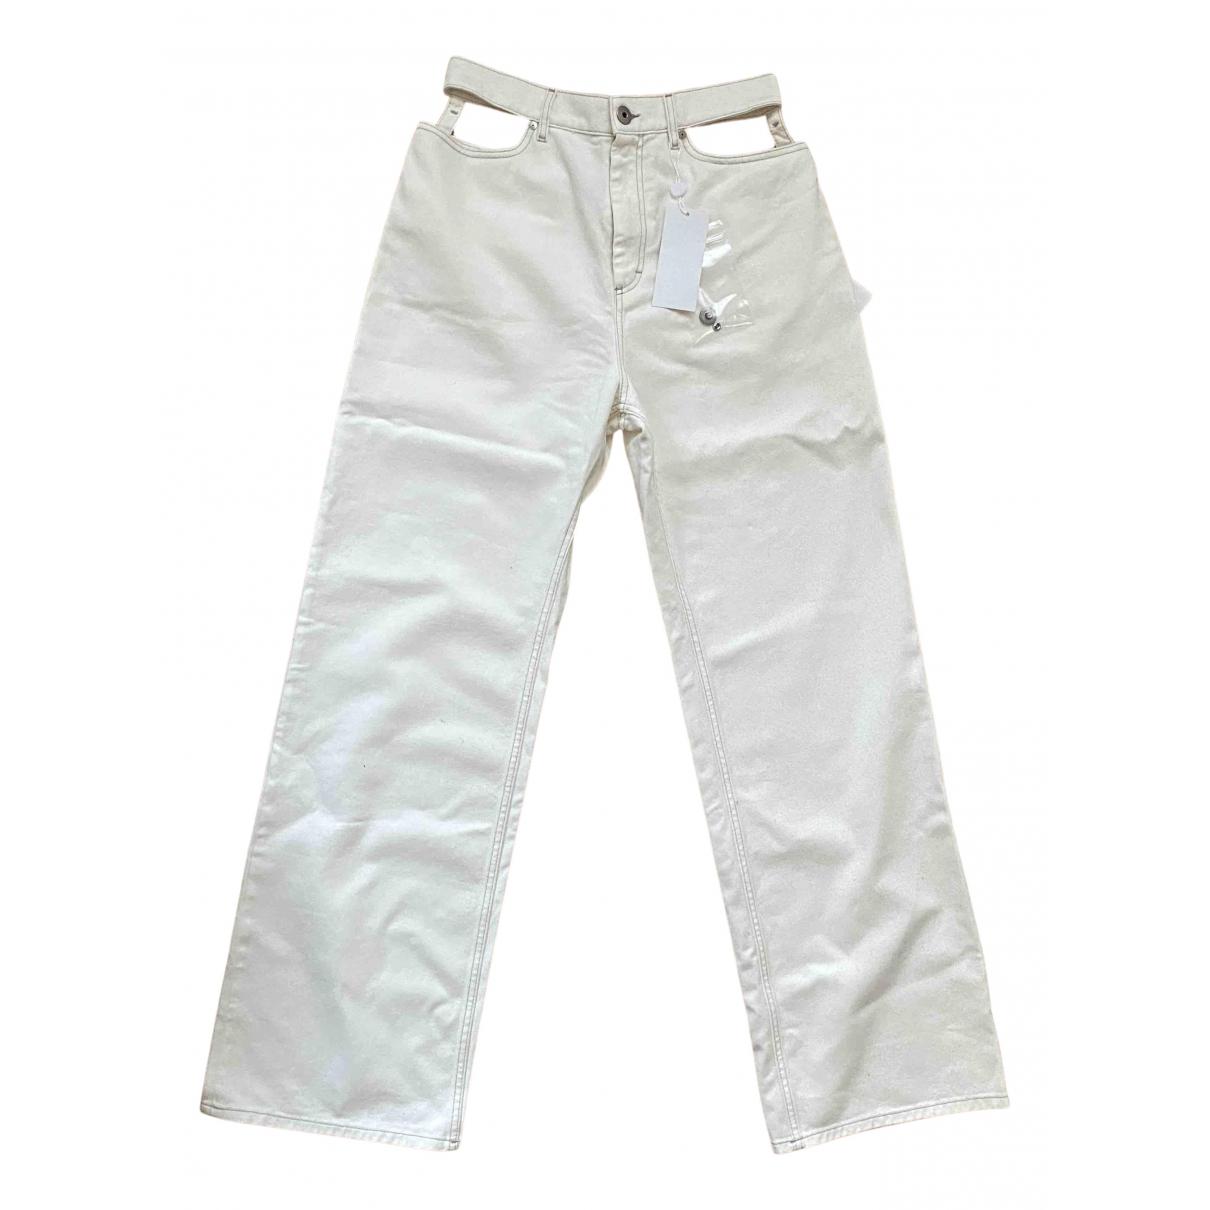 Maison Martin Margiela \N Shorts in  Weiss Denim - Jeans